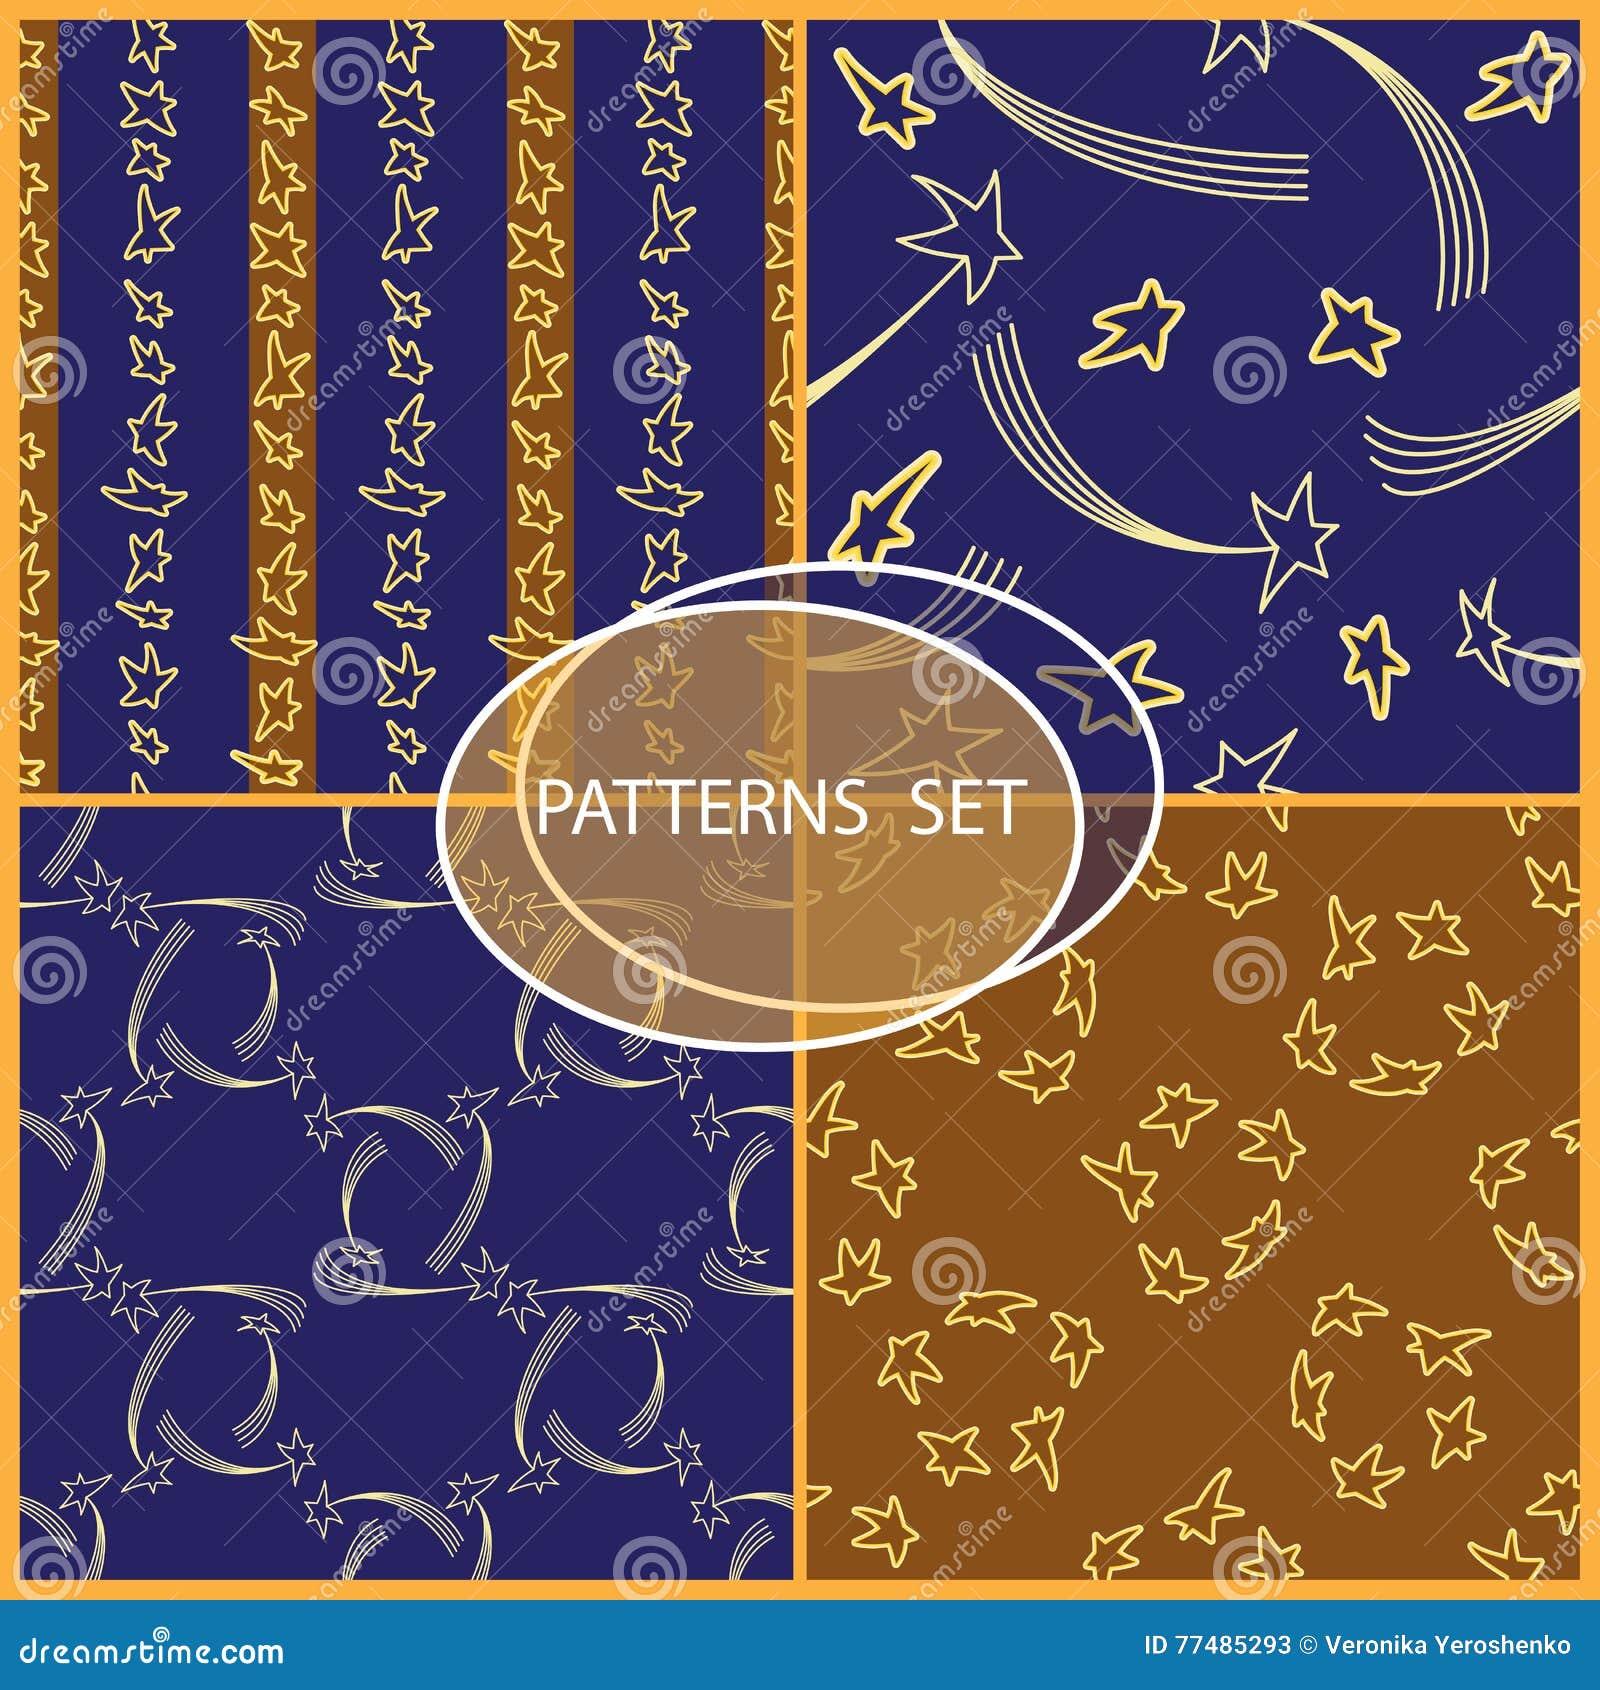 asteroid printable pattern - photo #42